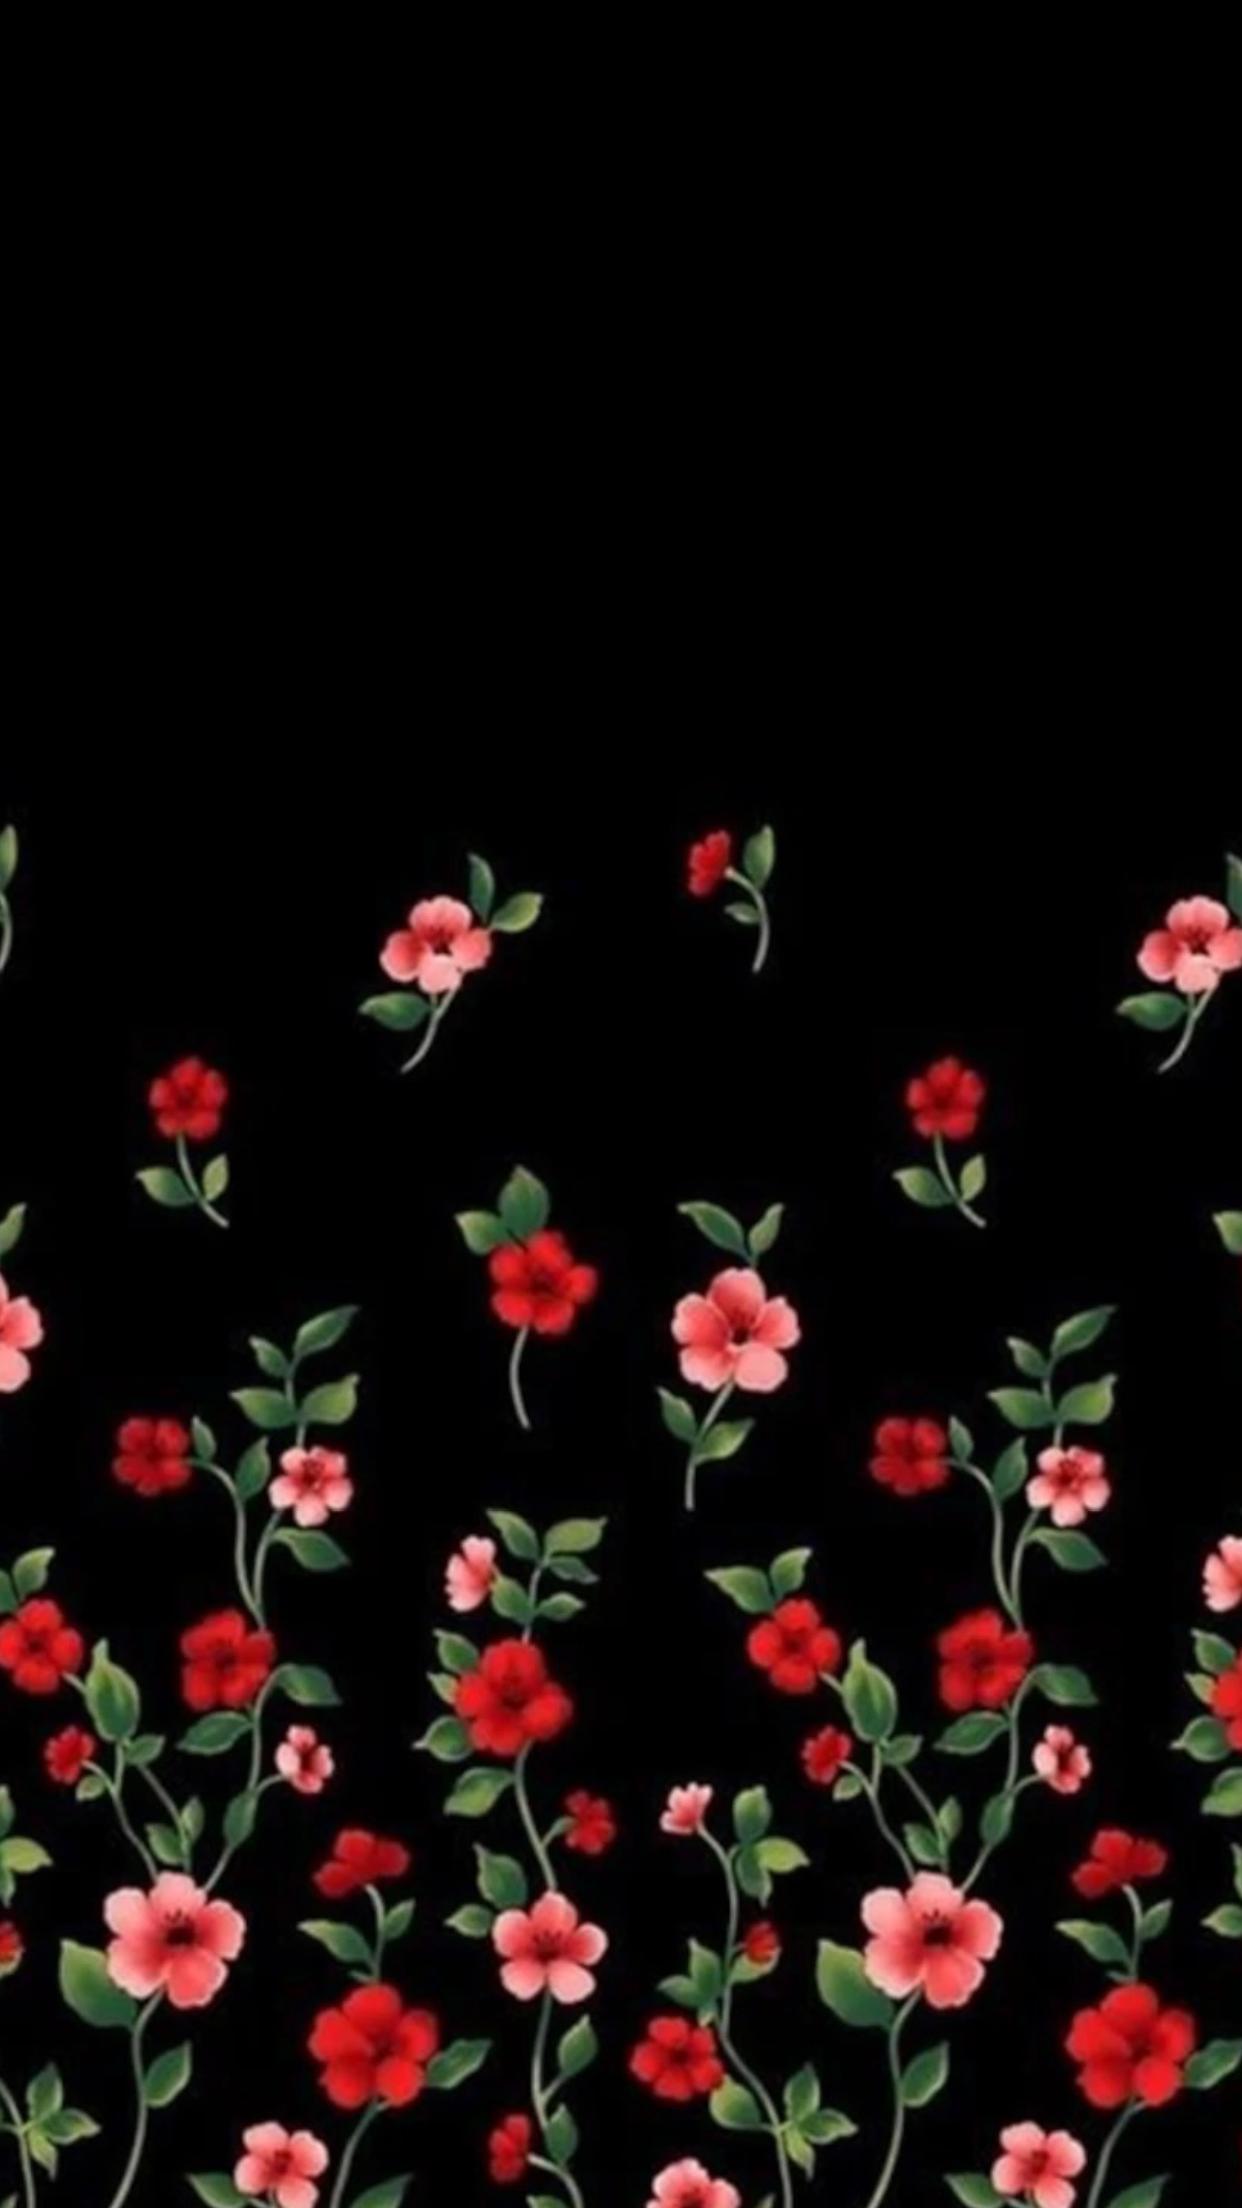 Httpsall Imagesiphone Wallpaper Flowers Hd 88 Iphone